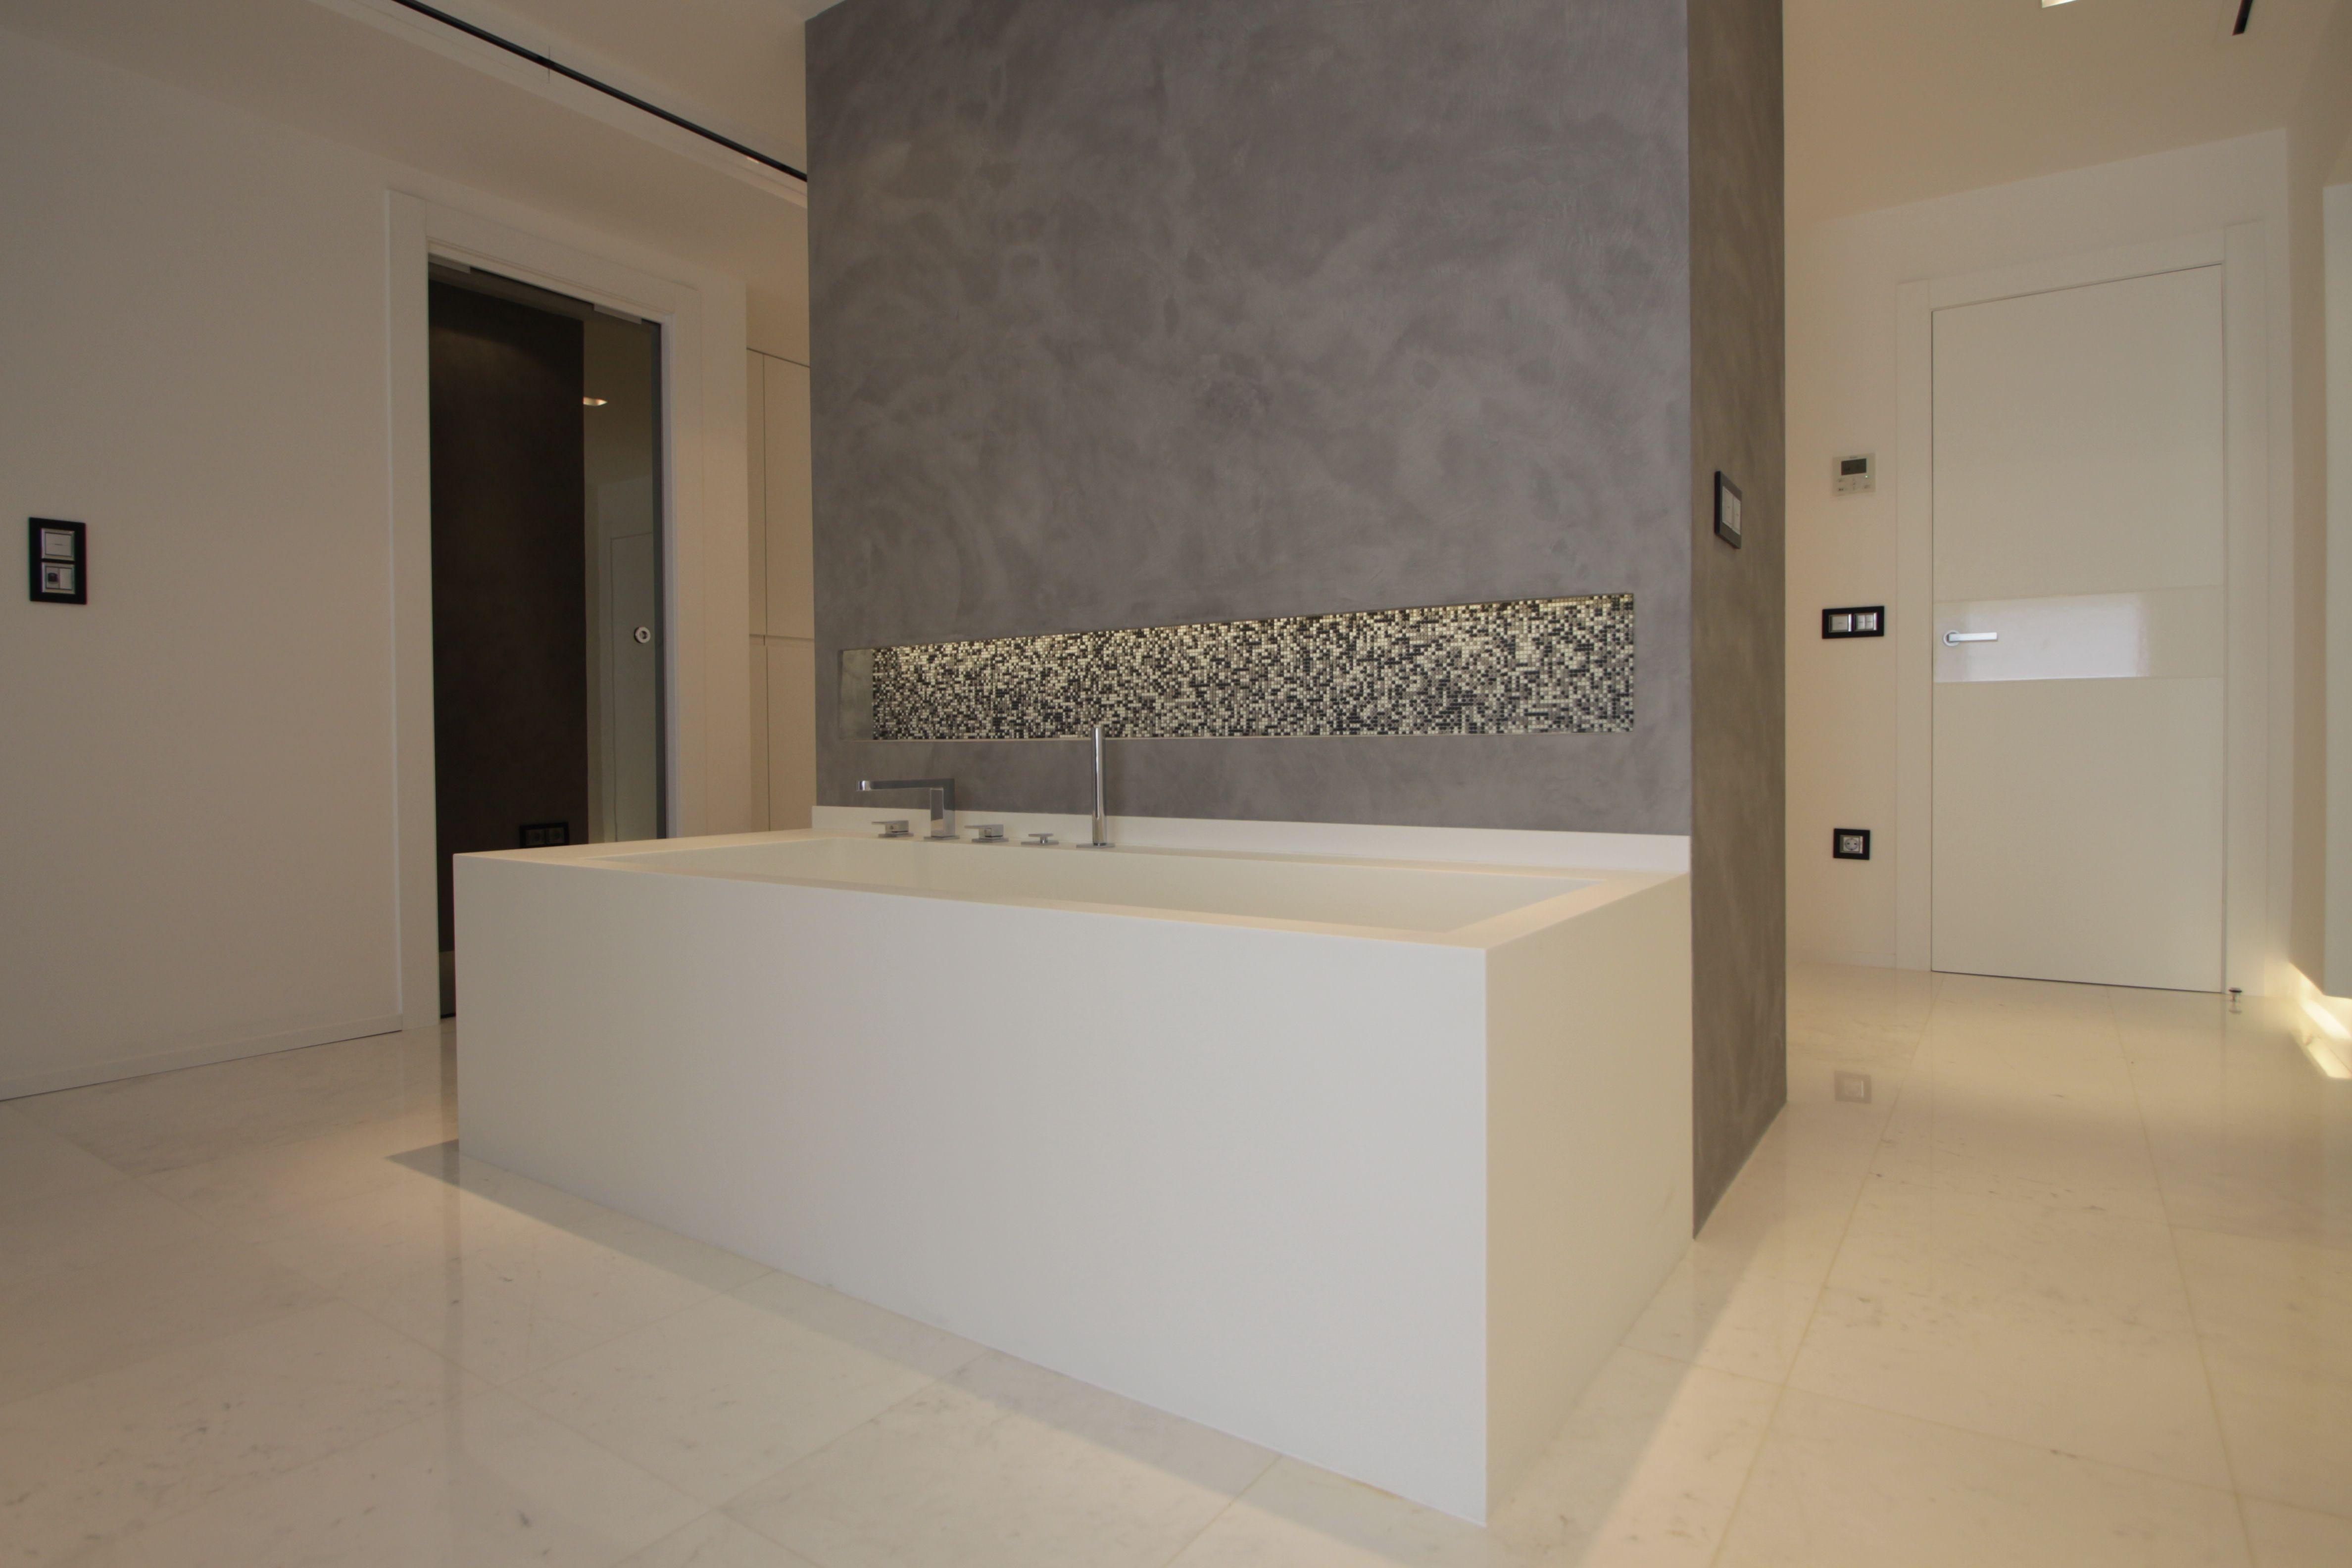 Baño completo. | Microcemento, Baños, Cuarto de baño